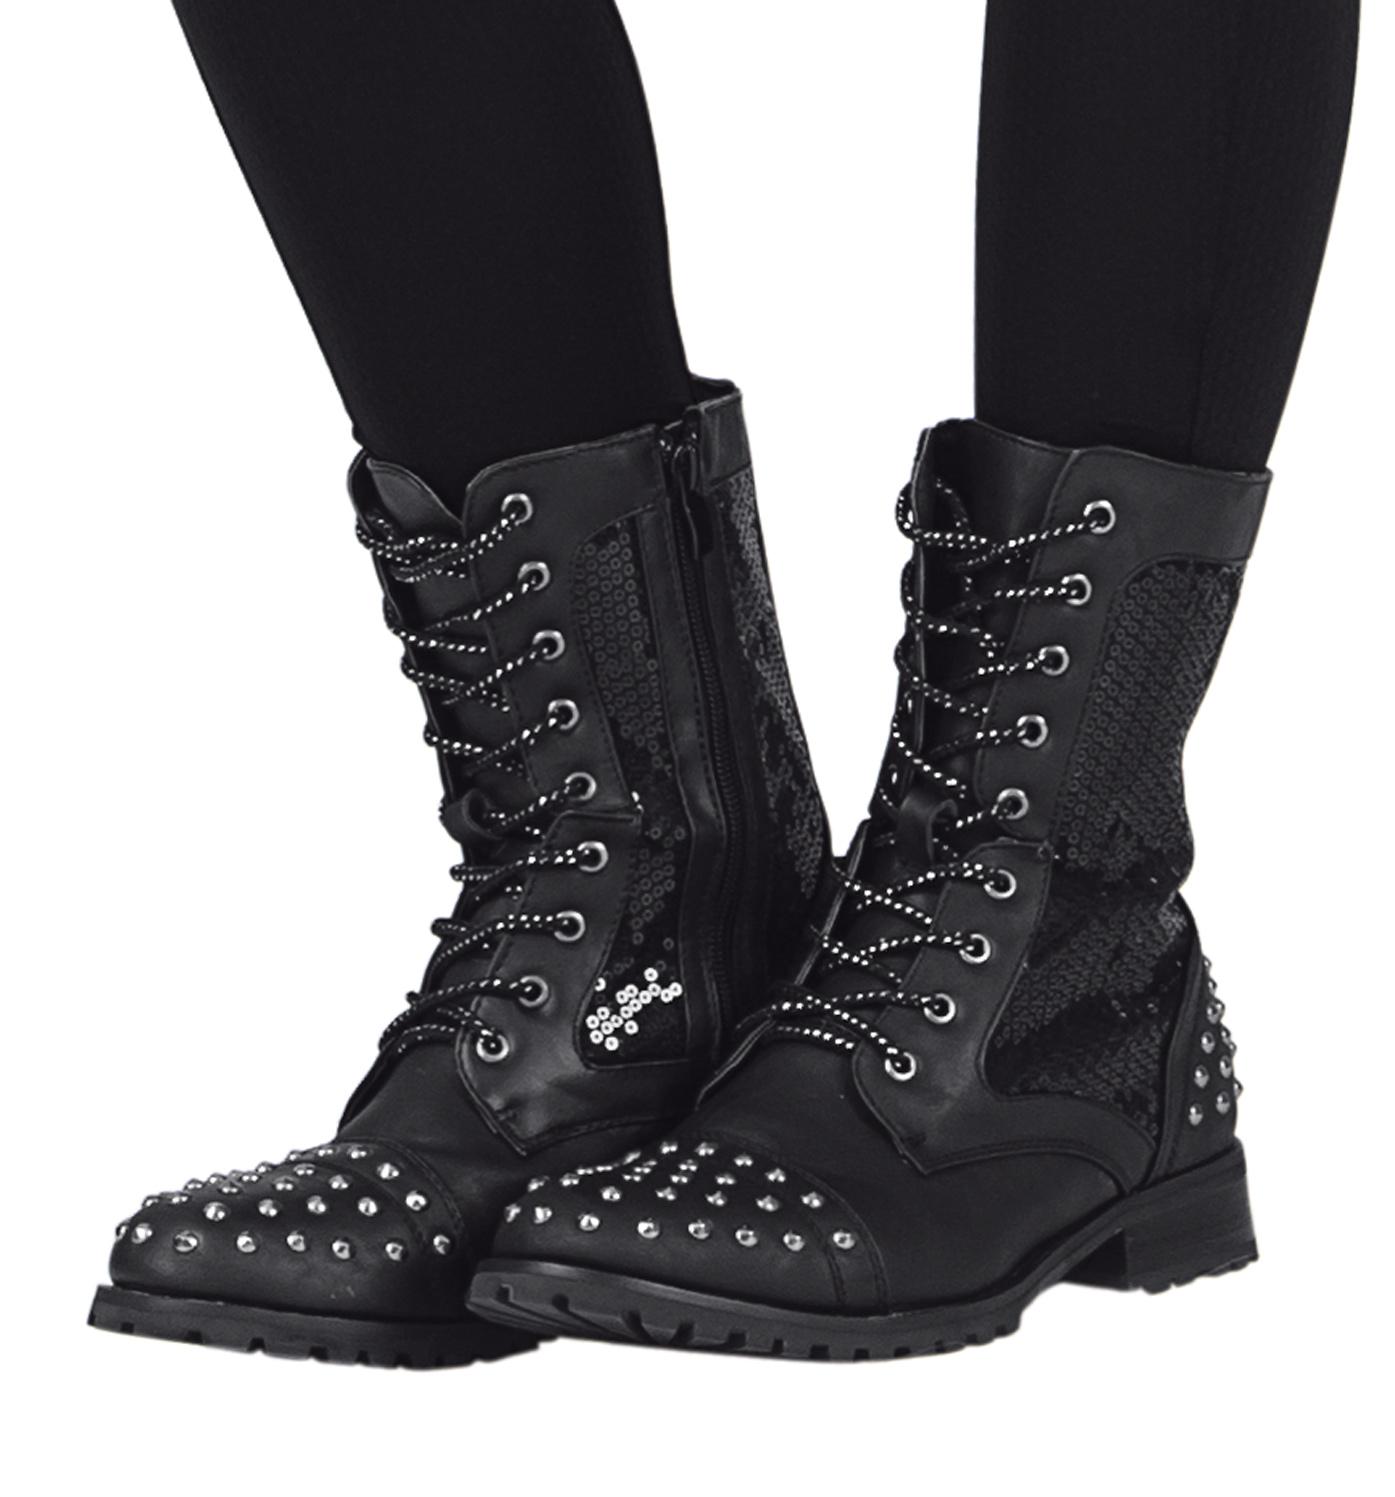 Girls studz combat boot style number gs11c